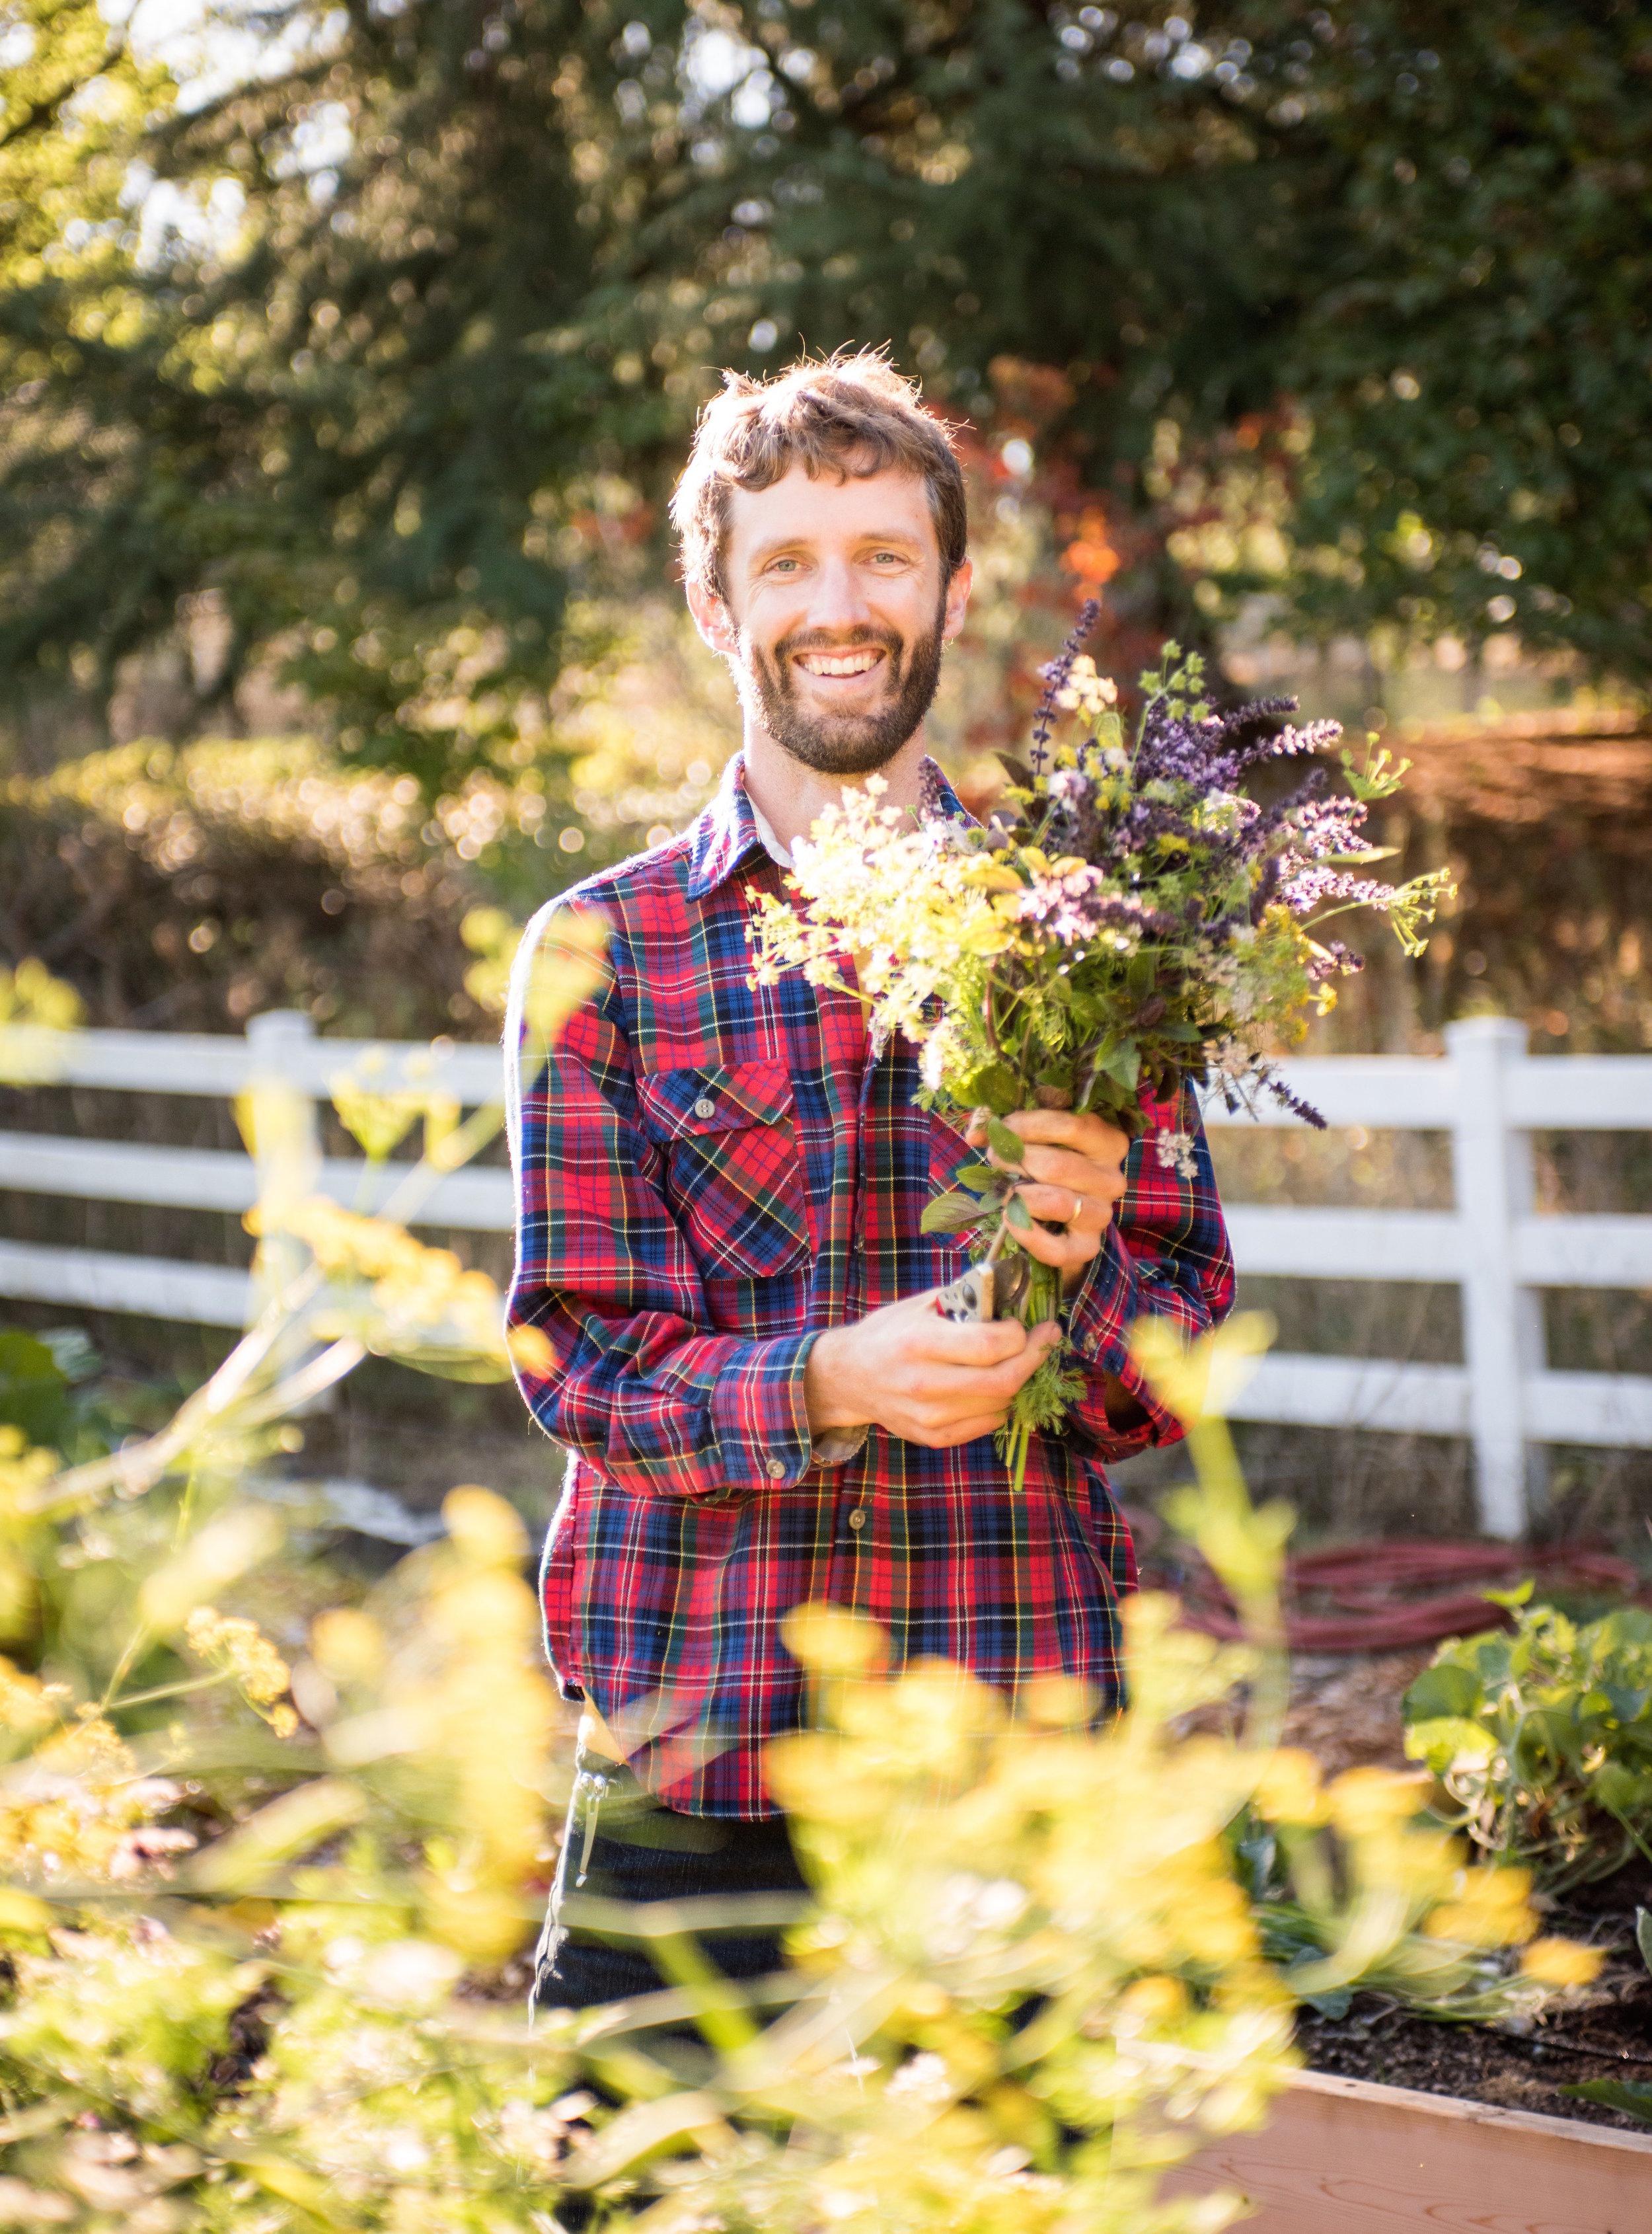 Ian Wilson, Owner and Founder, Garden Mentor